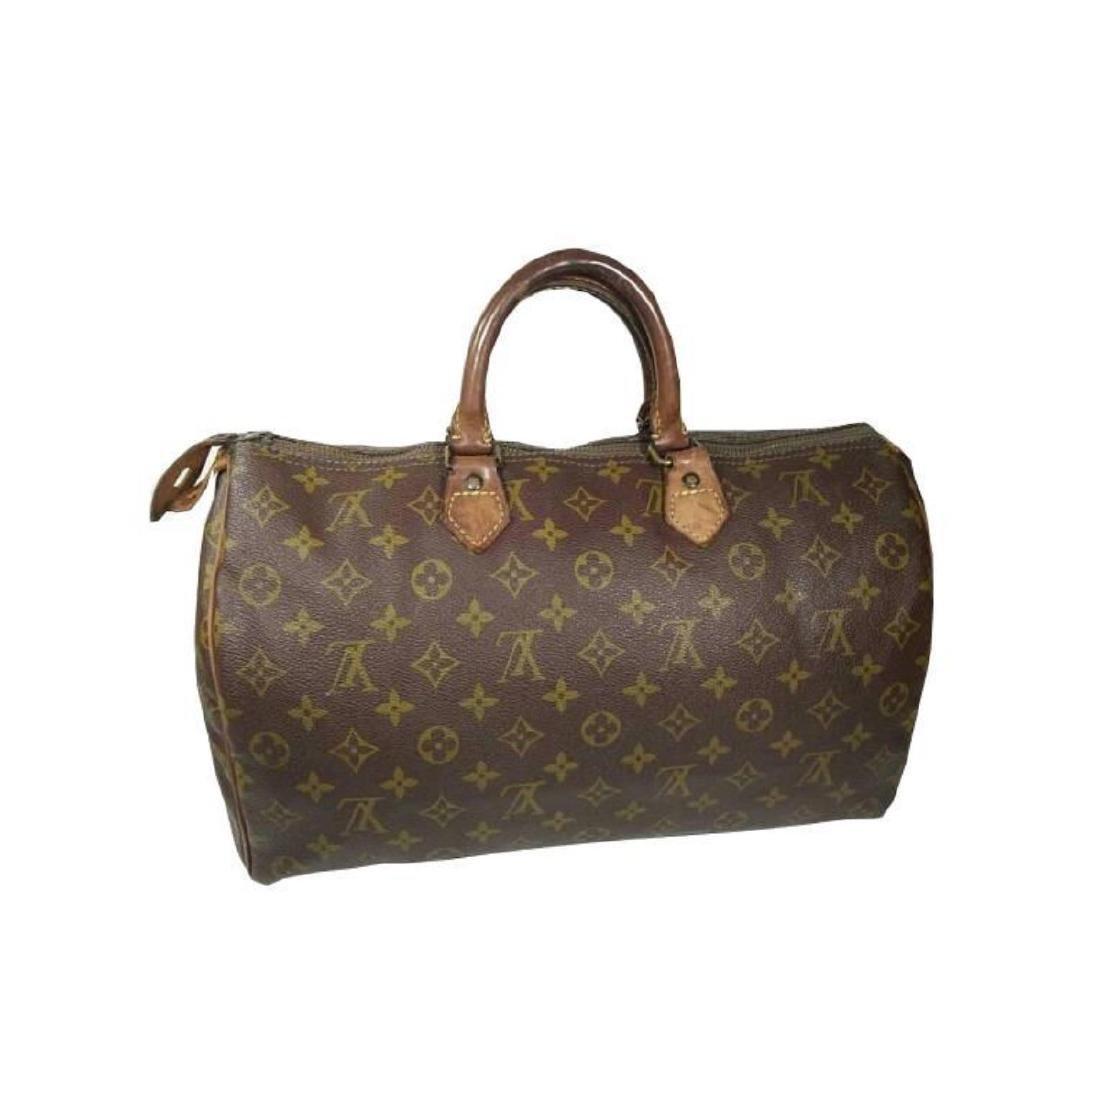 Auth Louis Vuitton Vintage Handbag Speedy 35 Monogram